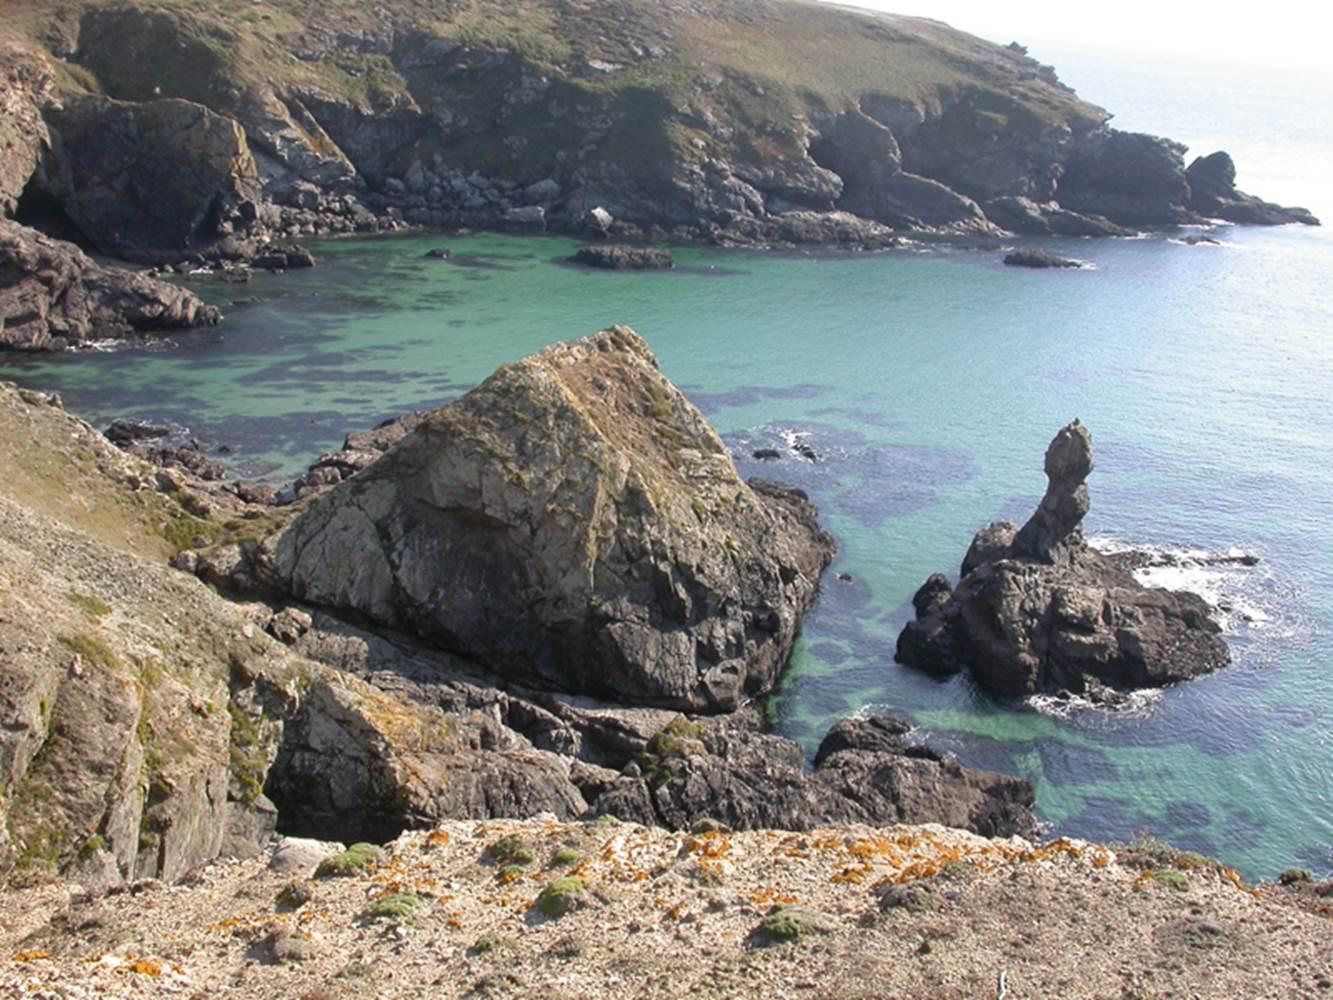 Site de la Pointe du Skeul - Locmaria - Belle-Ile - Morbihan Bretagne Sud ©